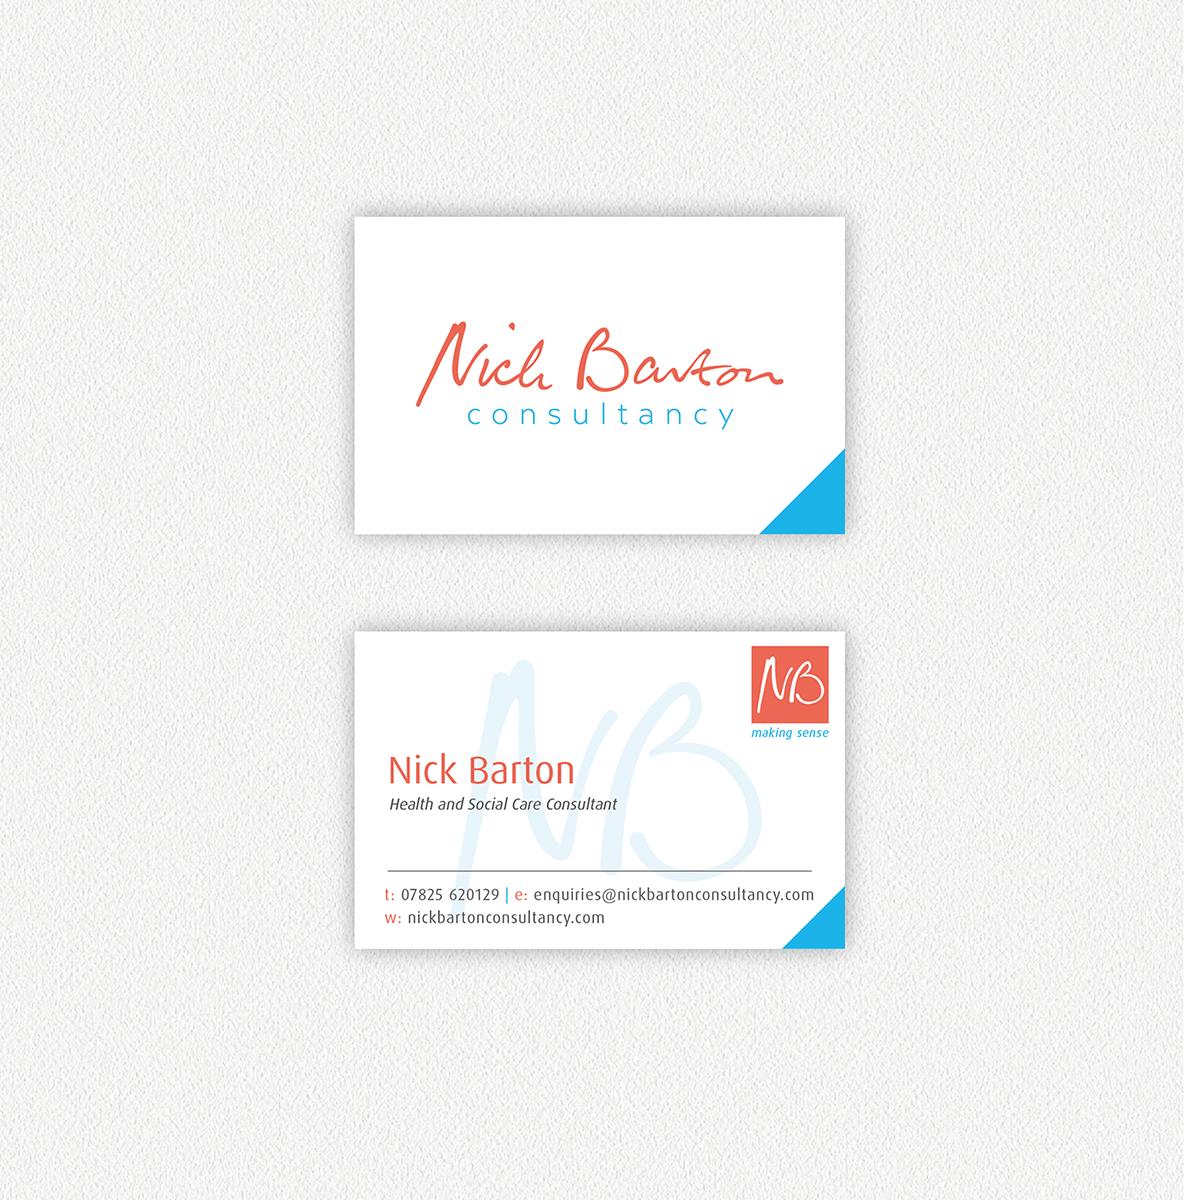 Nick Barton Consultancy — Business Card Design Dorset